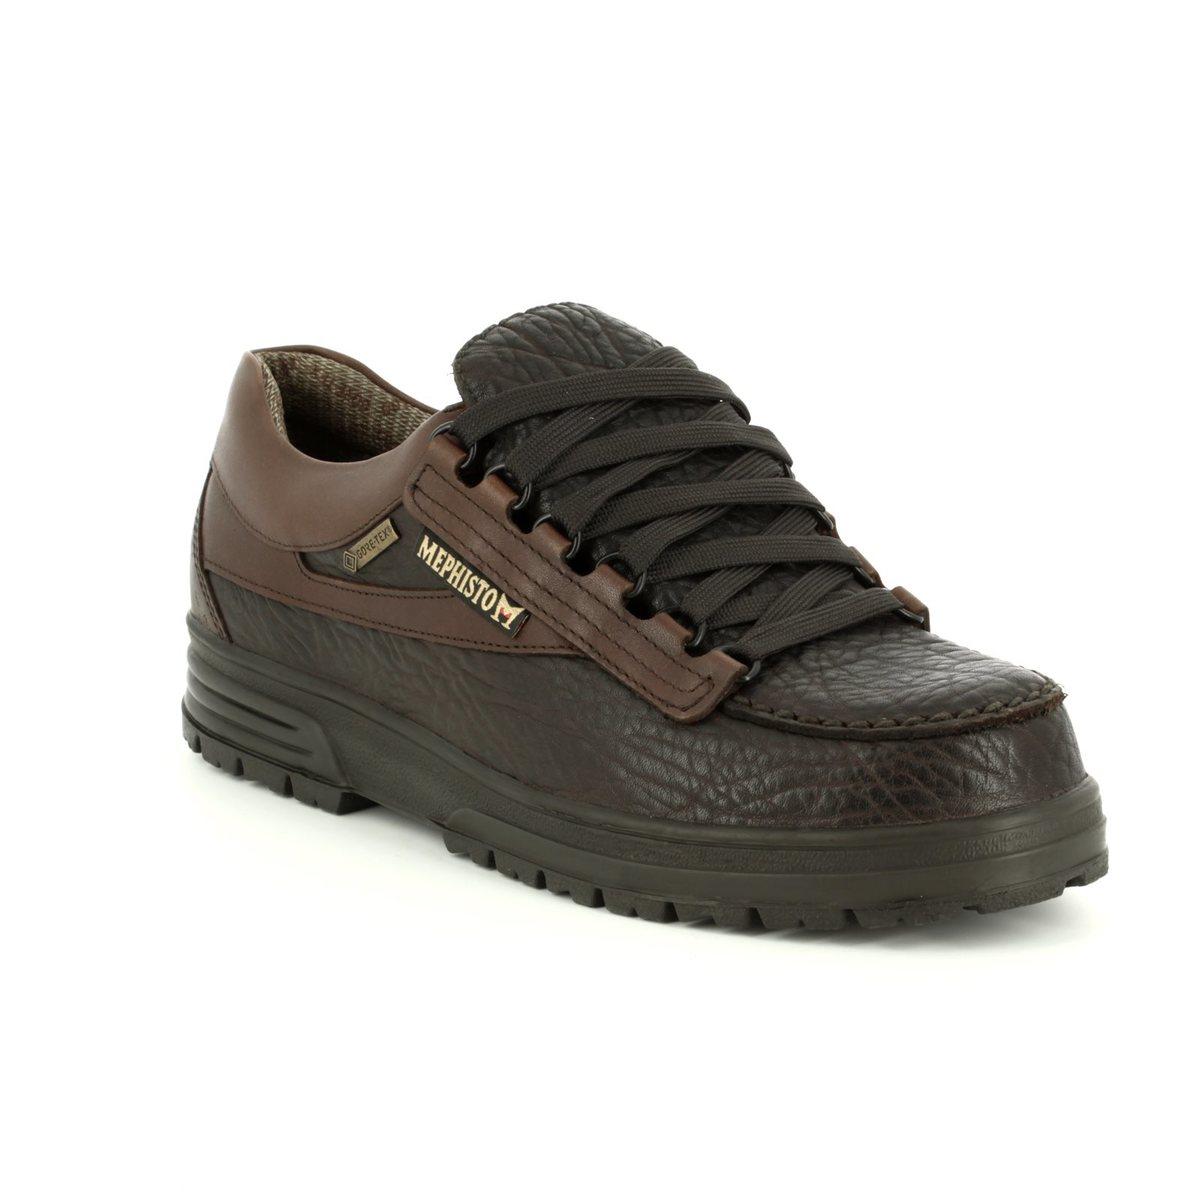 Mephisto Casual Shoes - Dark brown - B815C85/751 BREAK GORE-TEX